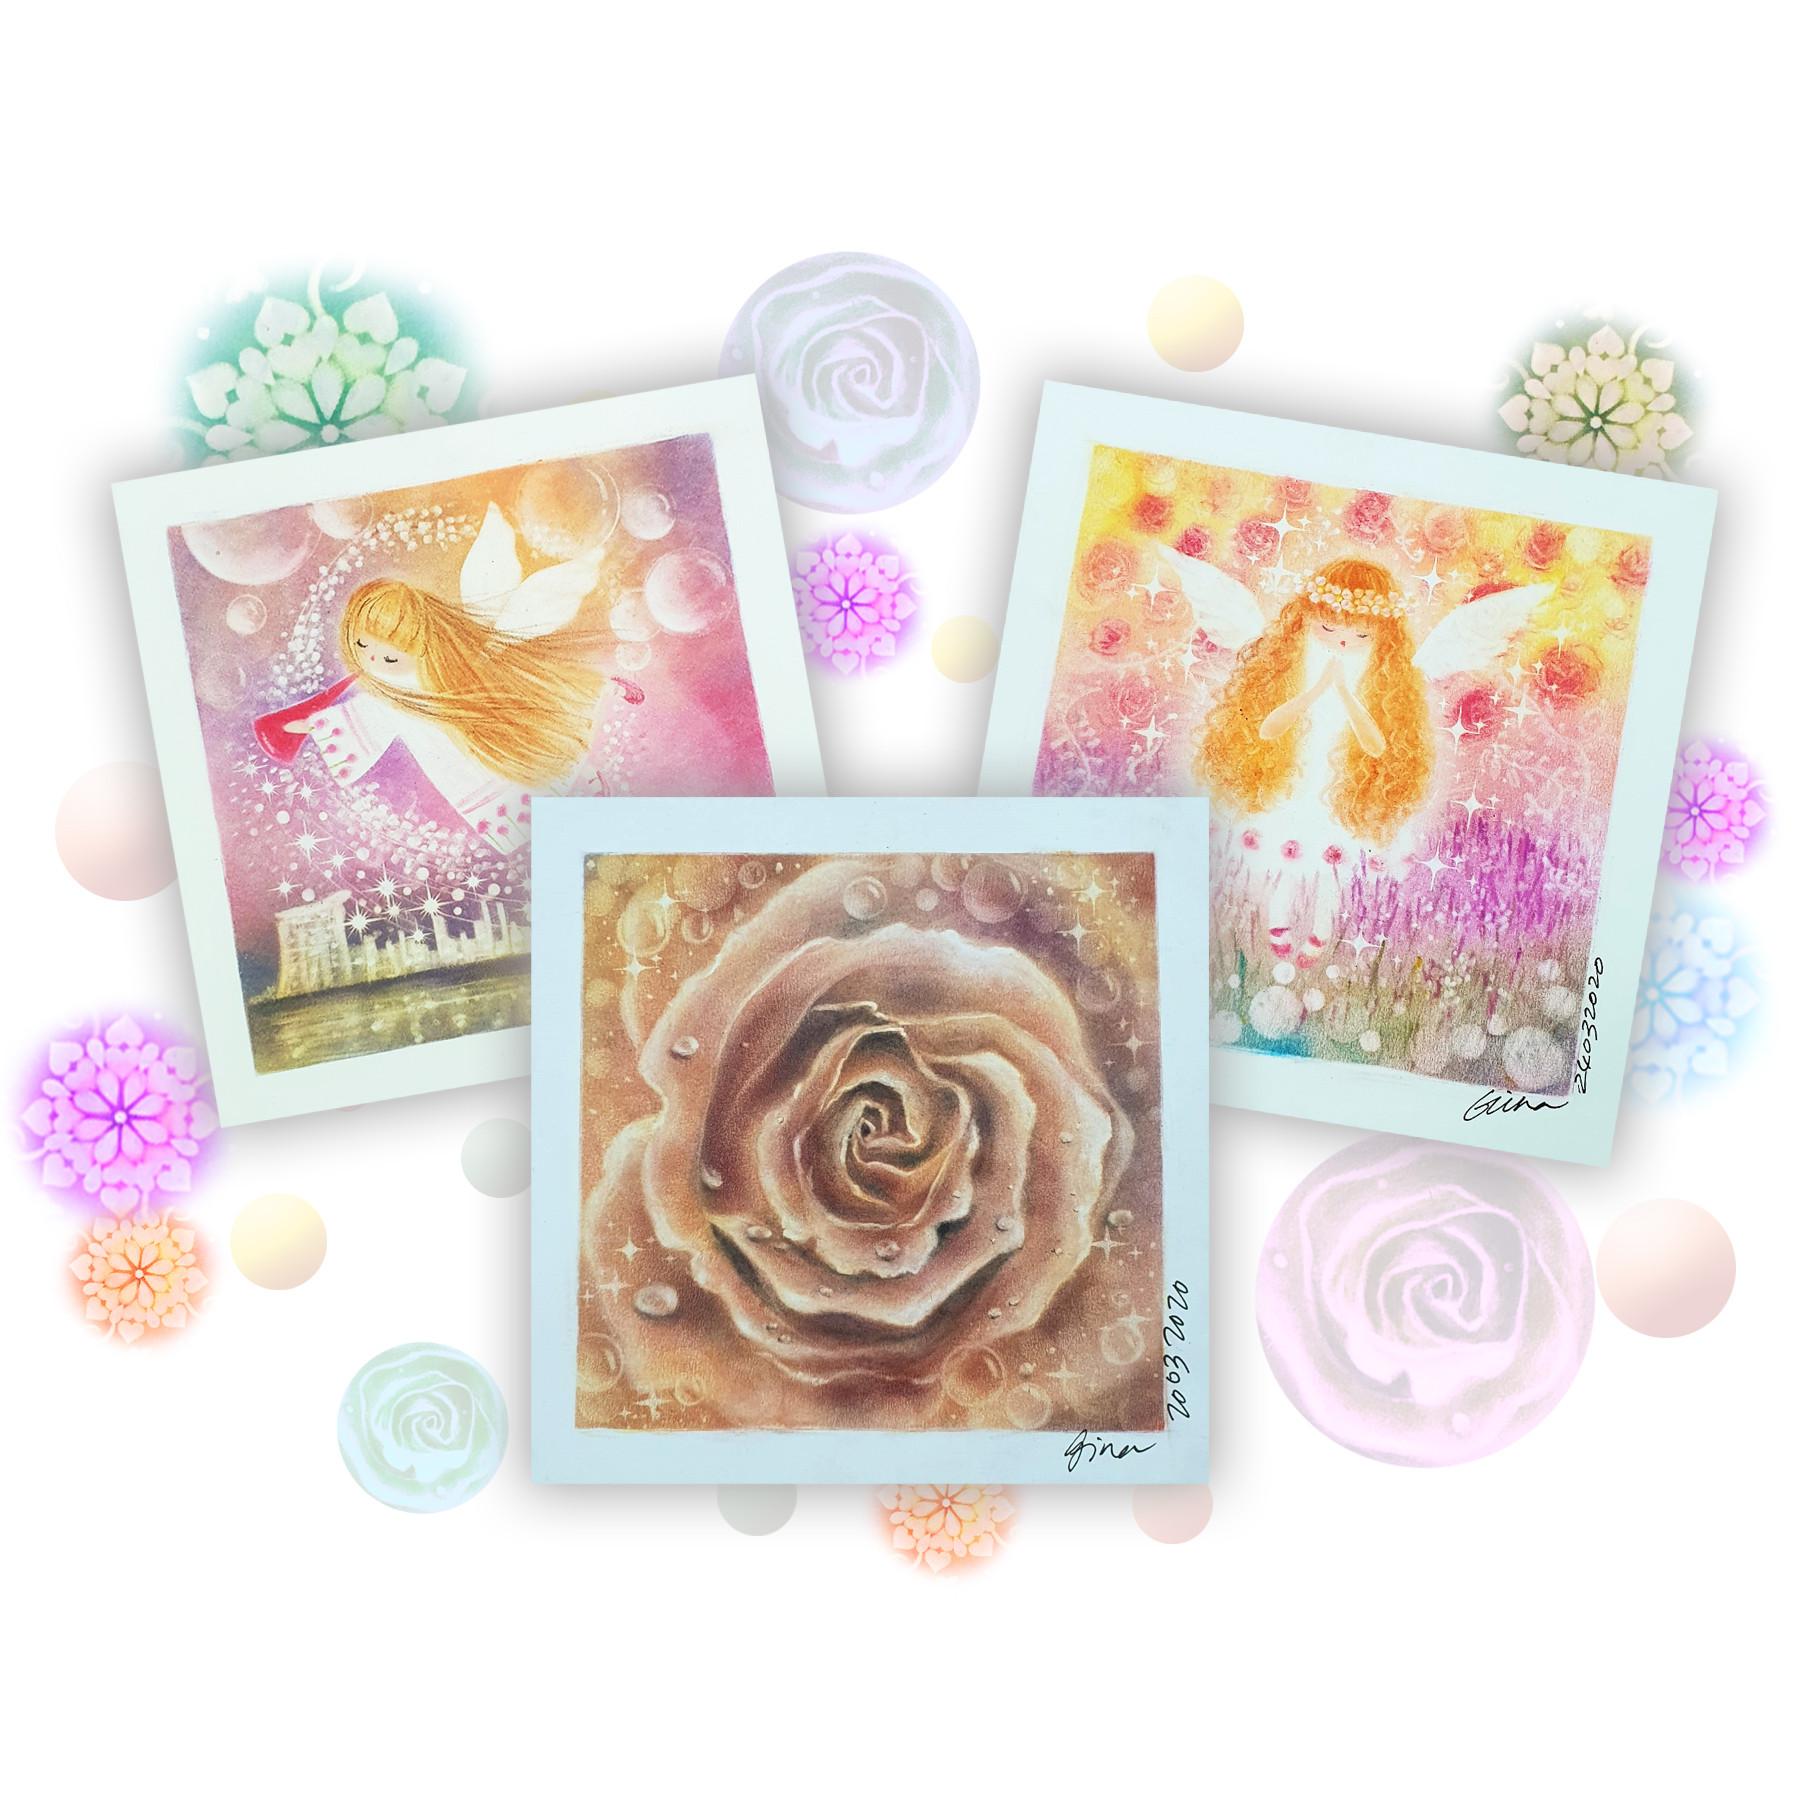 Part 2- Angel Blessing Pastel Art Course